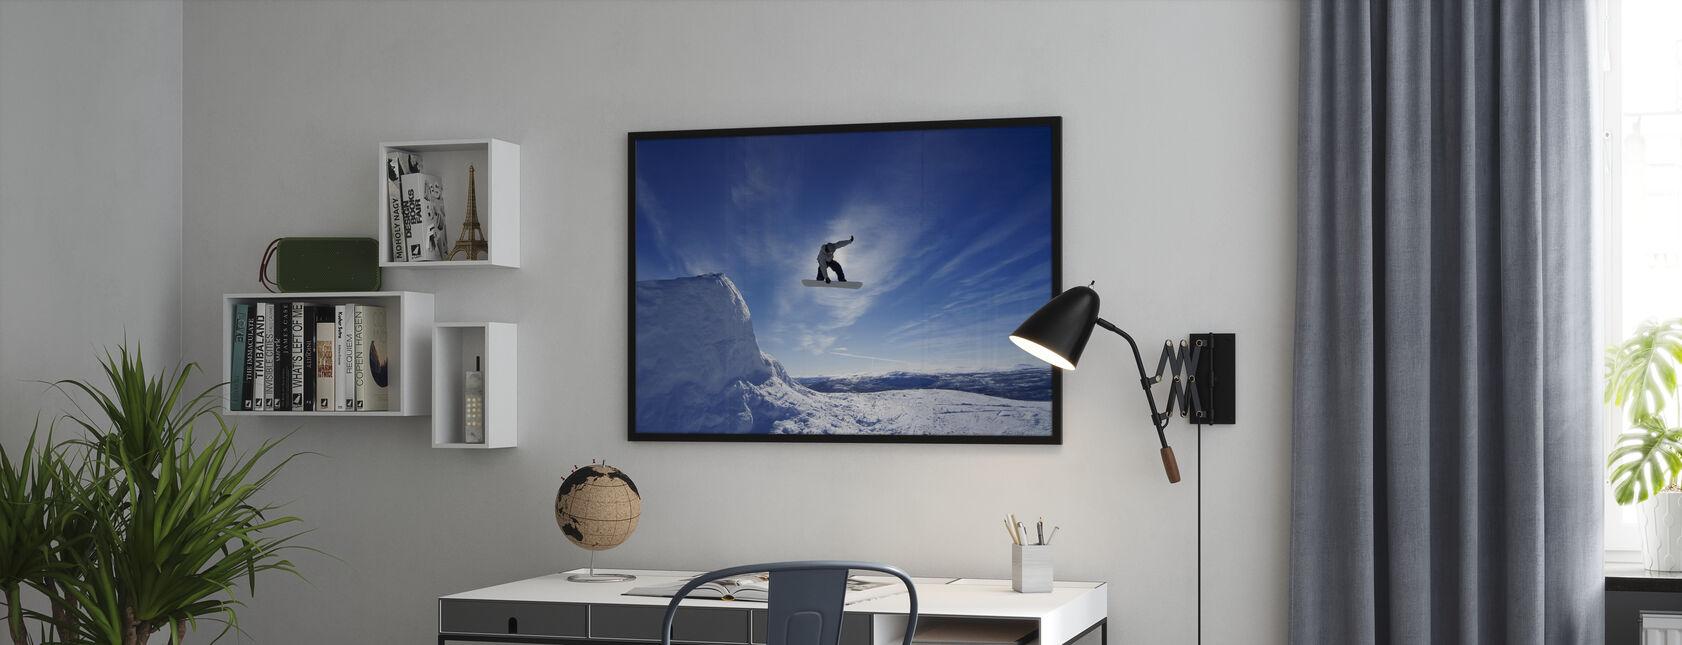 Snowboard Big Air Jump - Framed print - Office